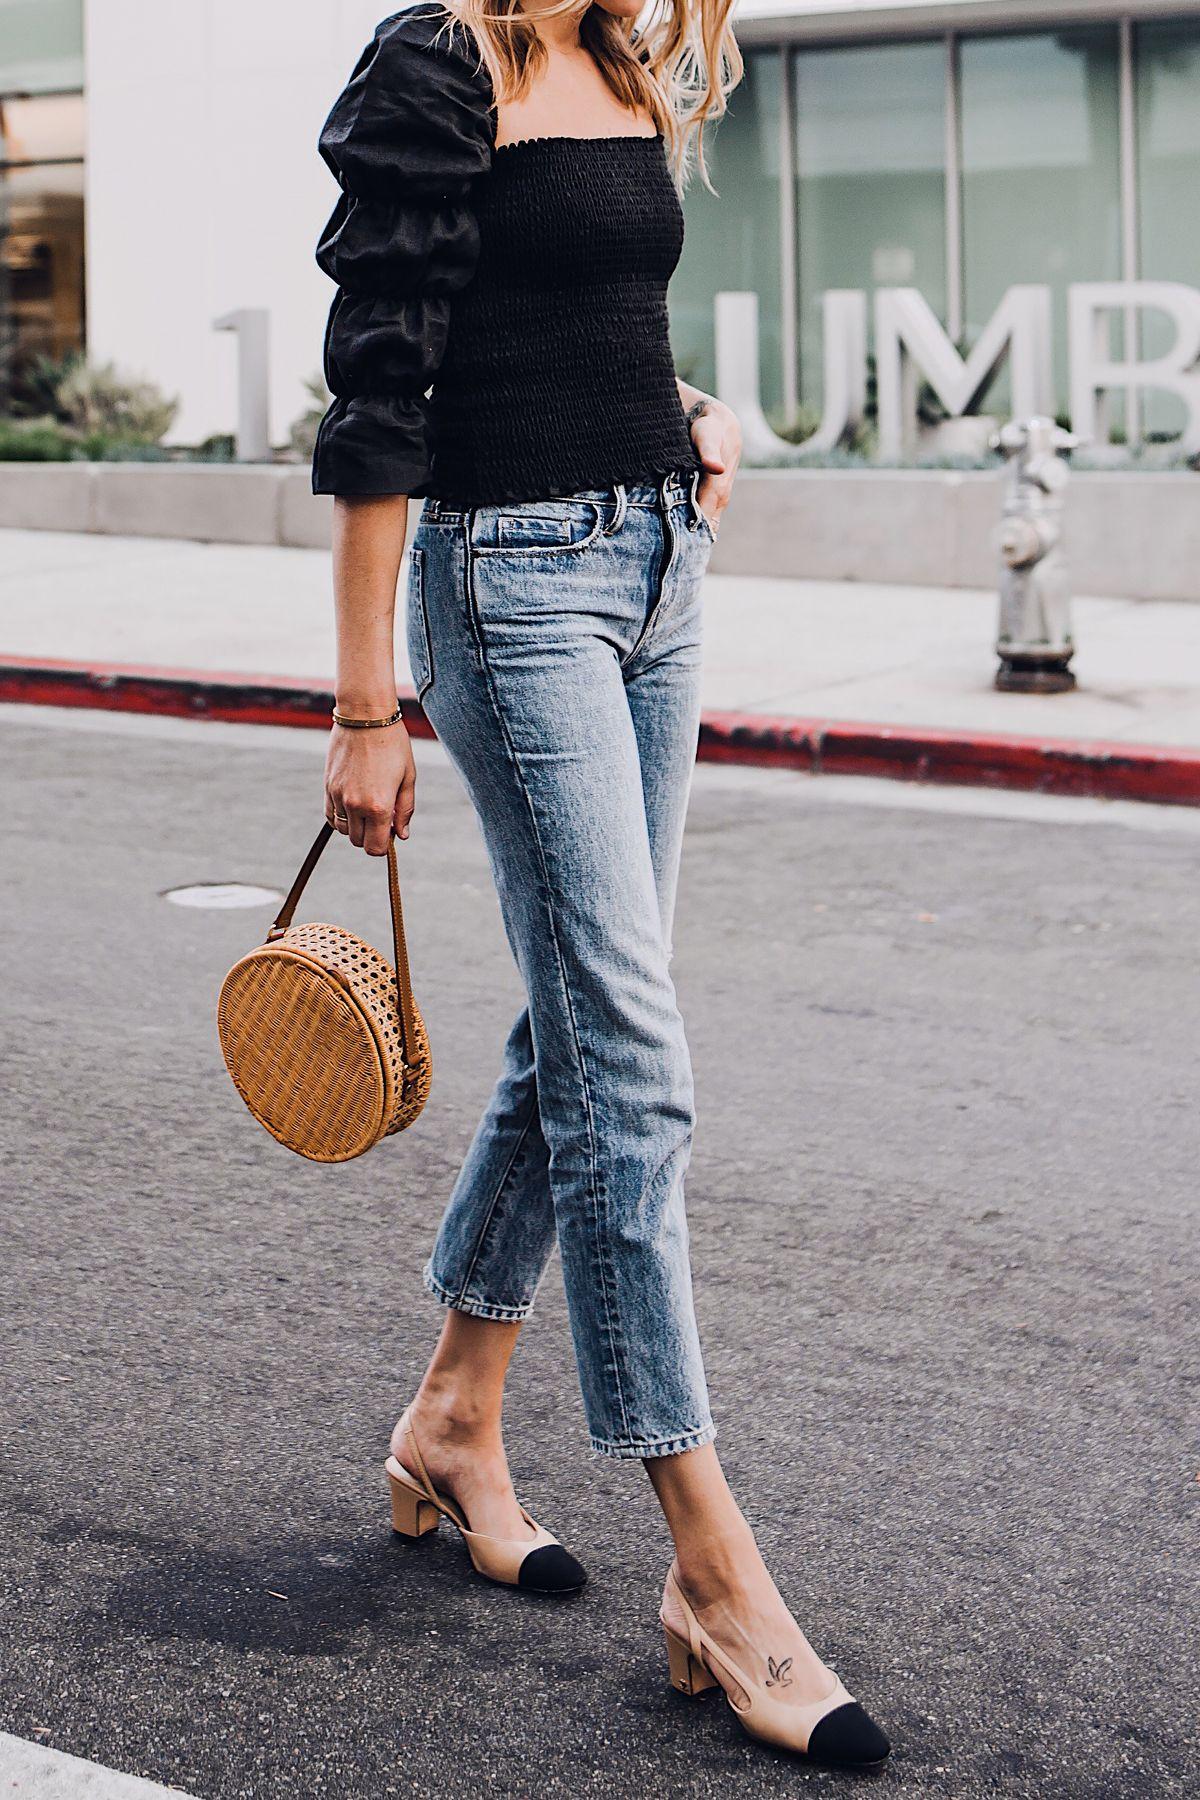 83a2a8038374 Blonde Woman Wearing Fashion Jackson Reformation Gala Top Black Straight  Leg Ripped Jeans Chanel Slingback Shoes Cane Circle Straw Handbag Fashion  Jackson ...